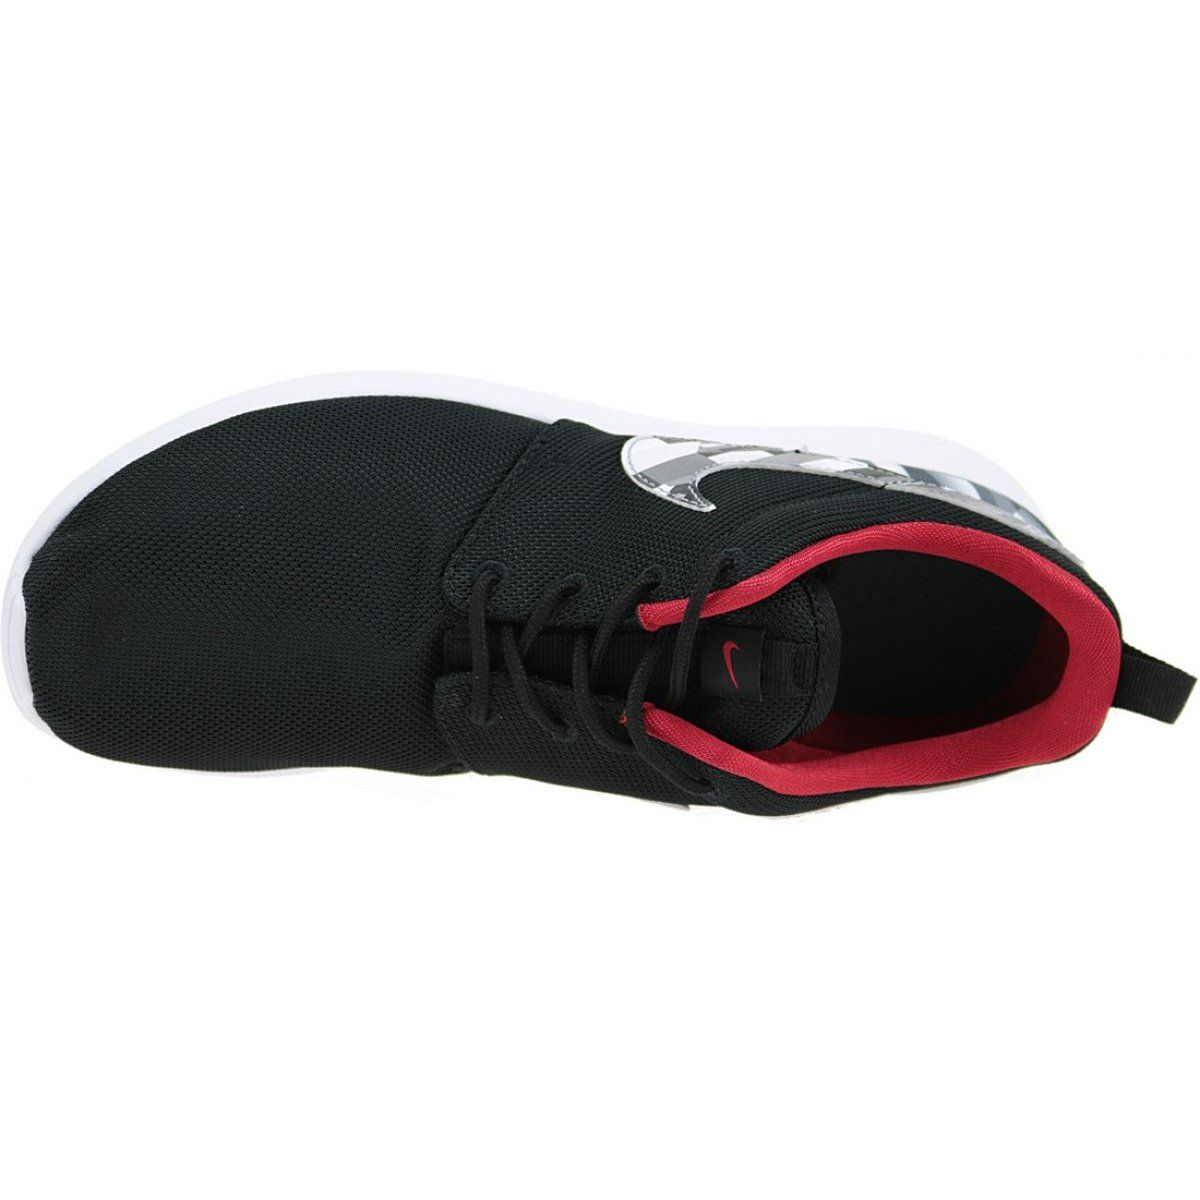 Buty Nike Roshe One Print Gs W 677782 012 Czarne Nike Roshe Nike Roshes